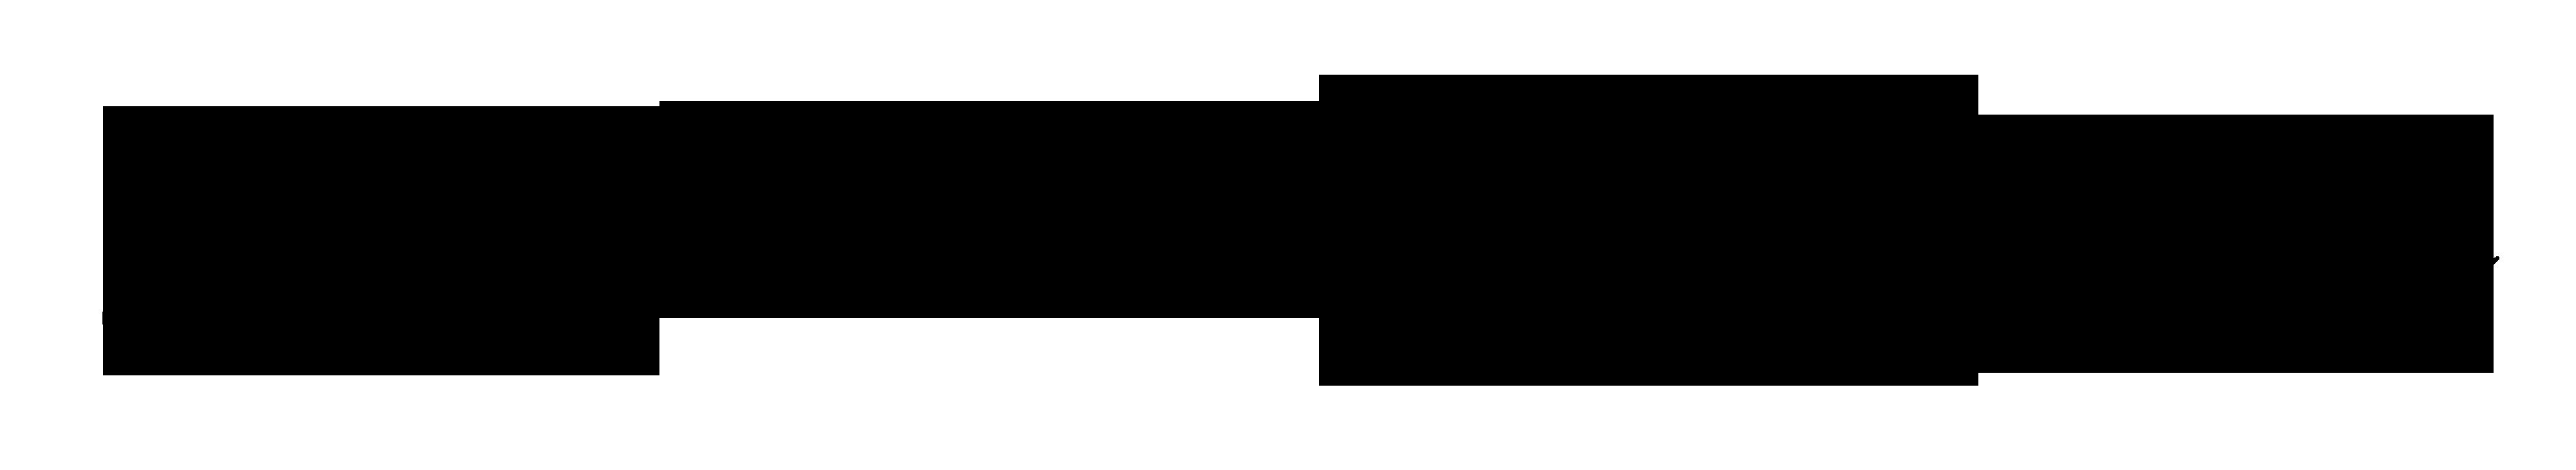 Anamika Misra Signature